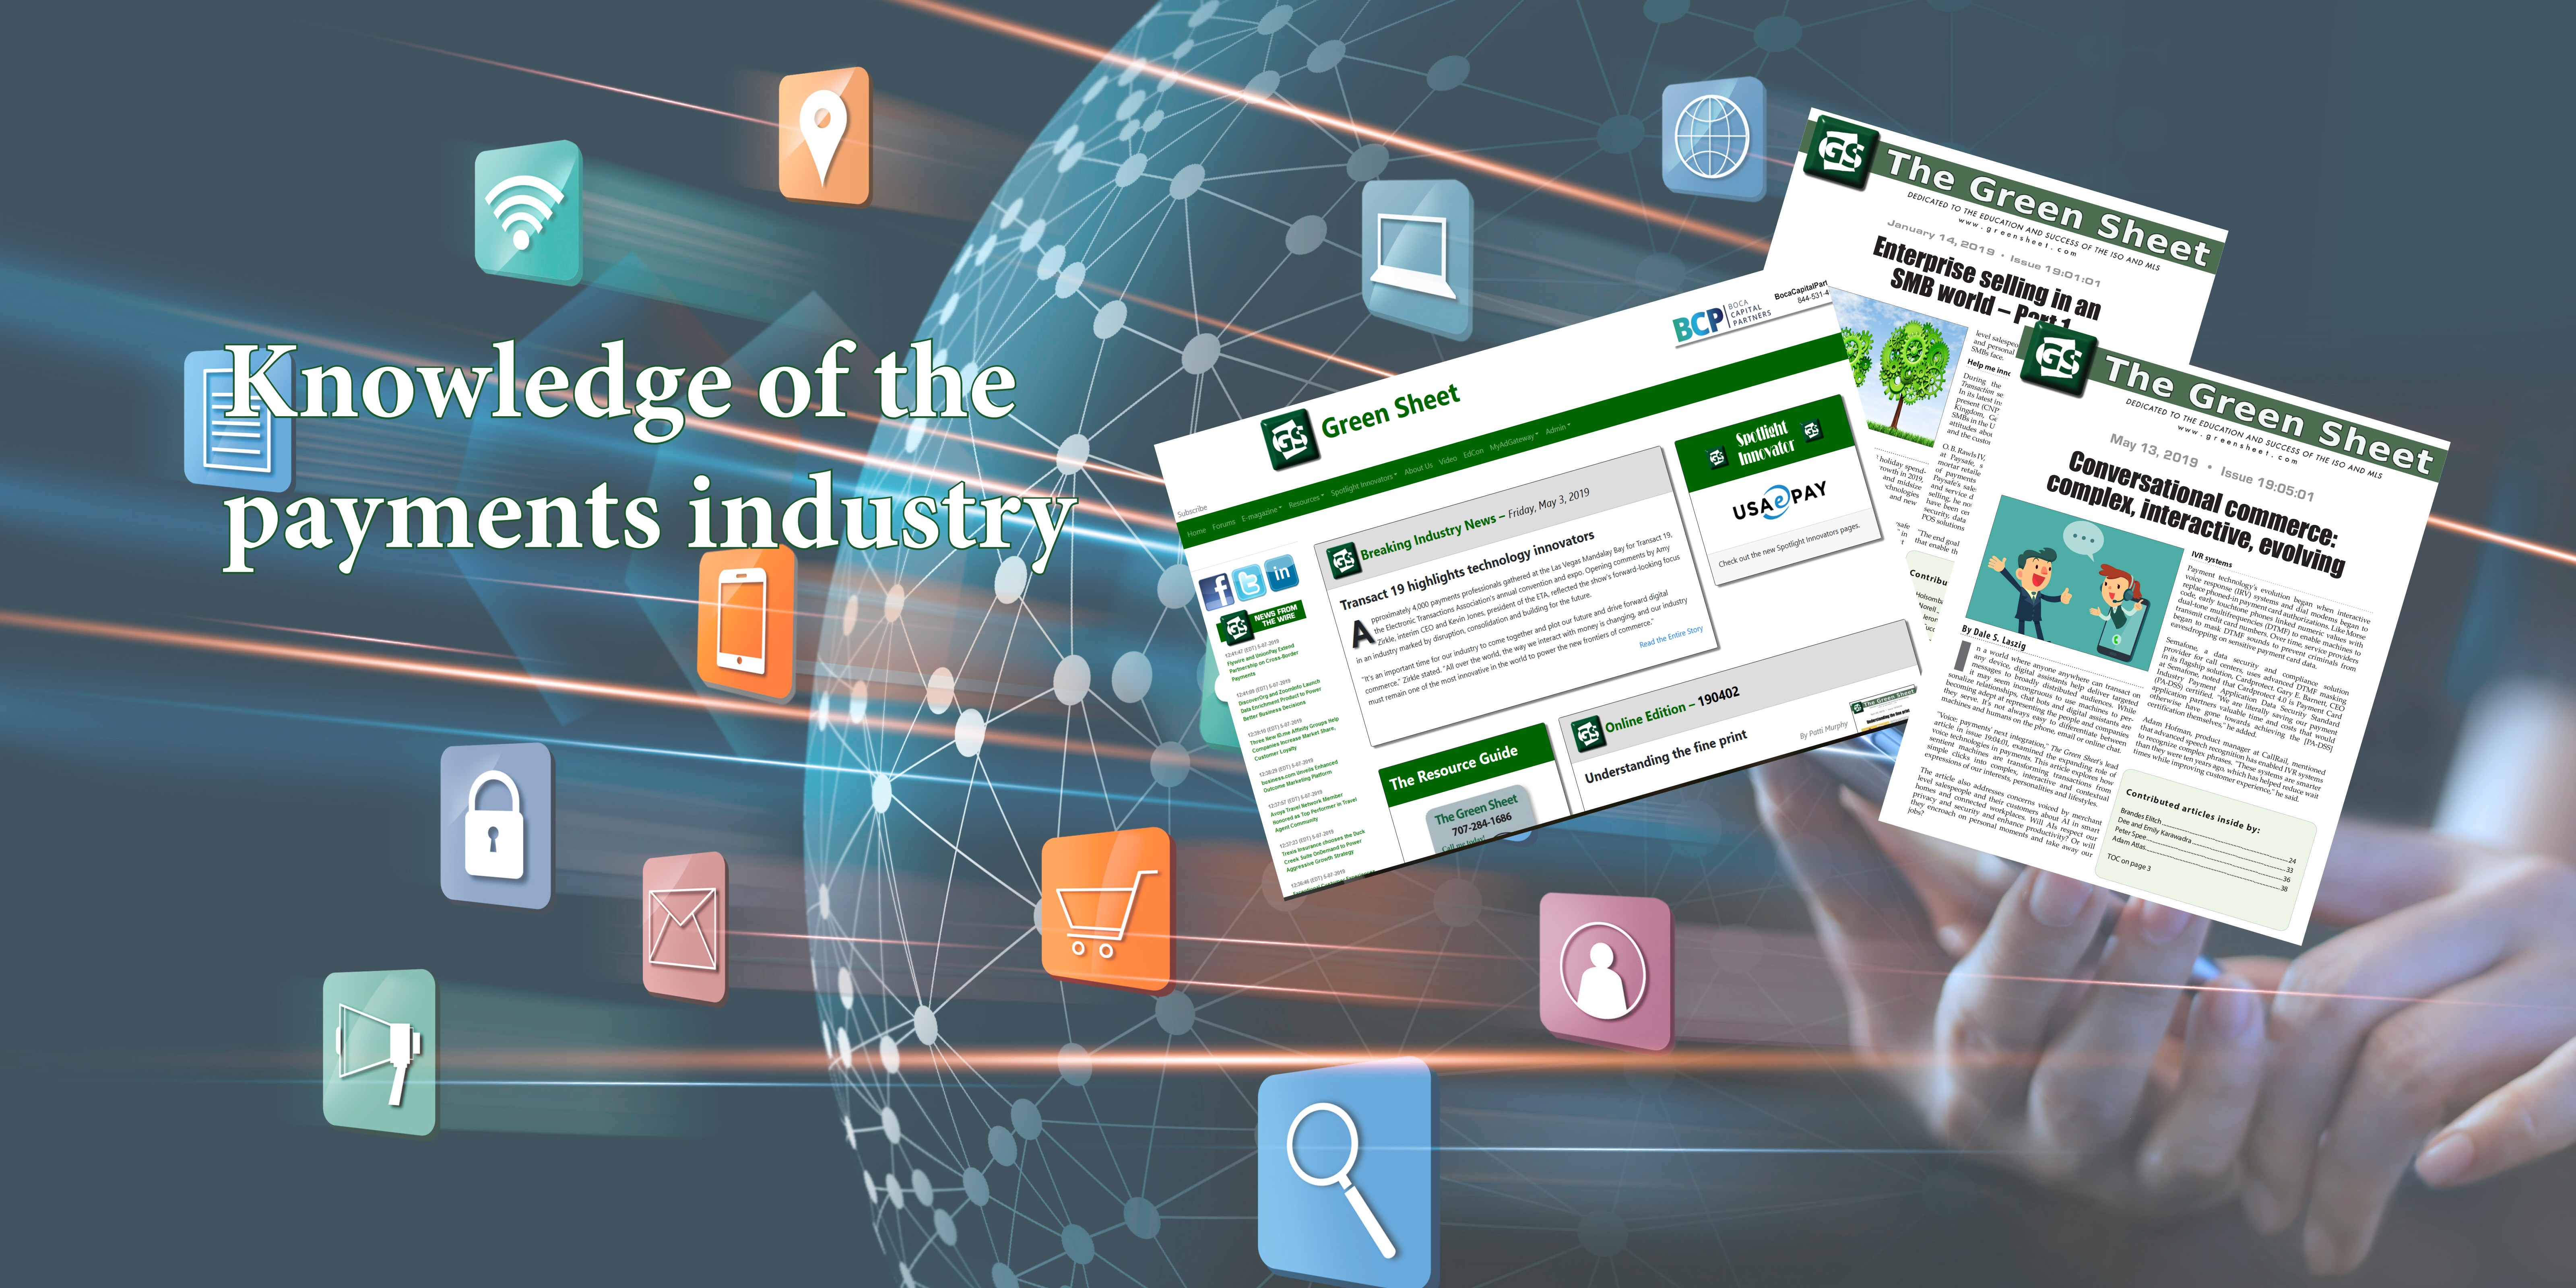 The Green Sheet | LinkedIn